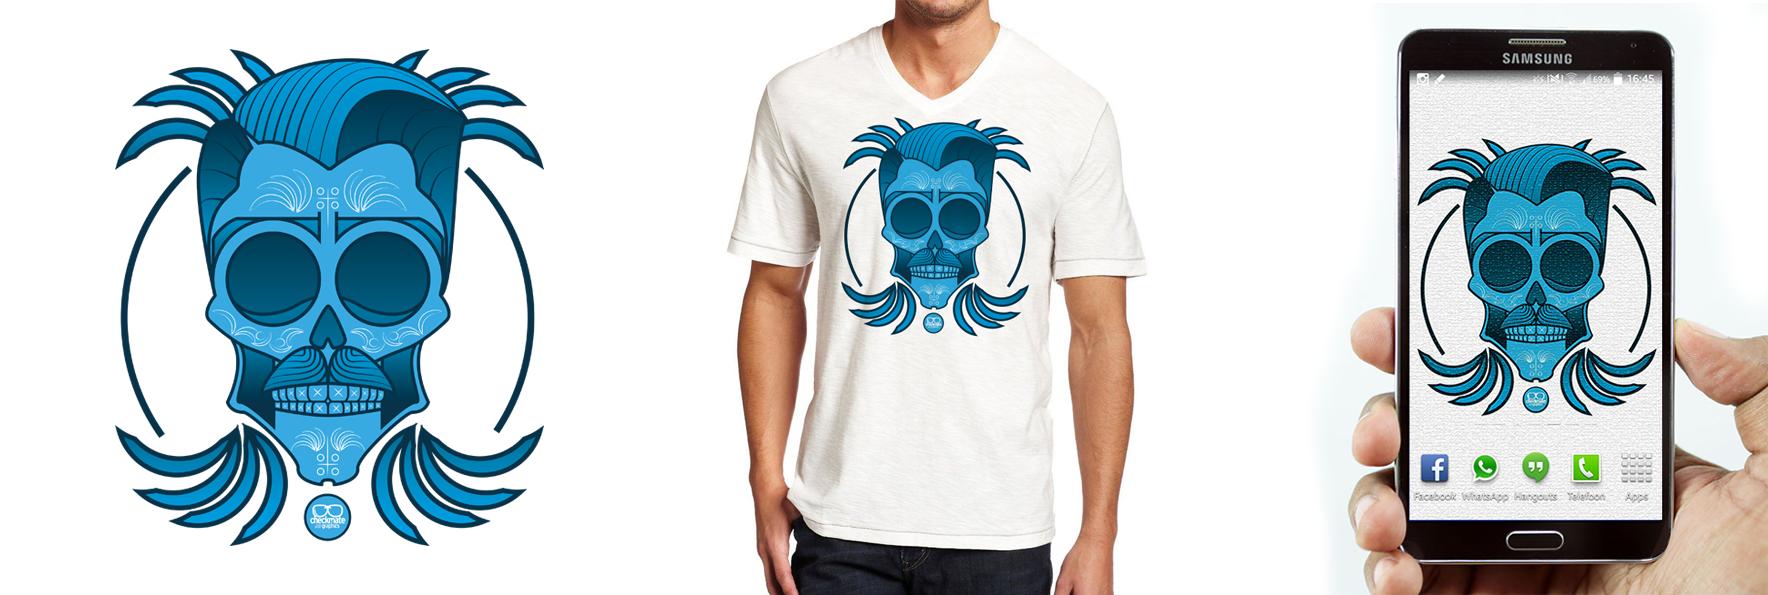 #MexicanSkull Design by Coen Visser